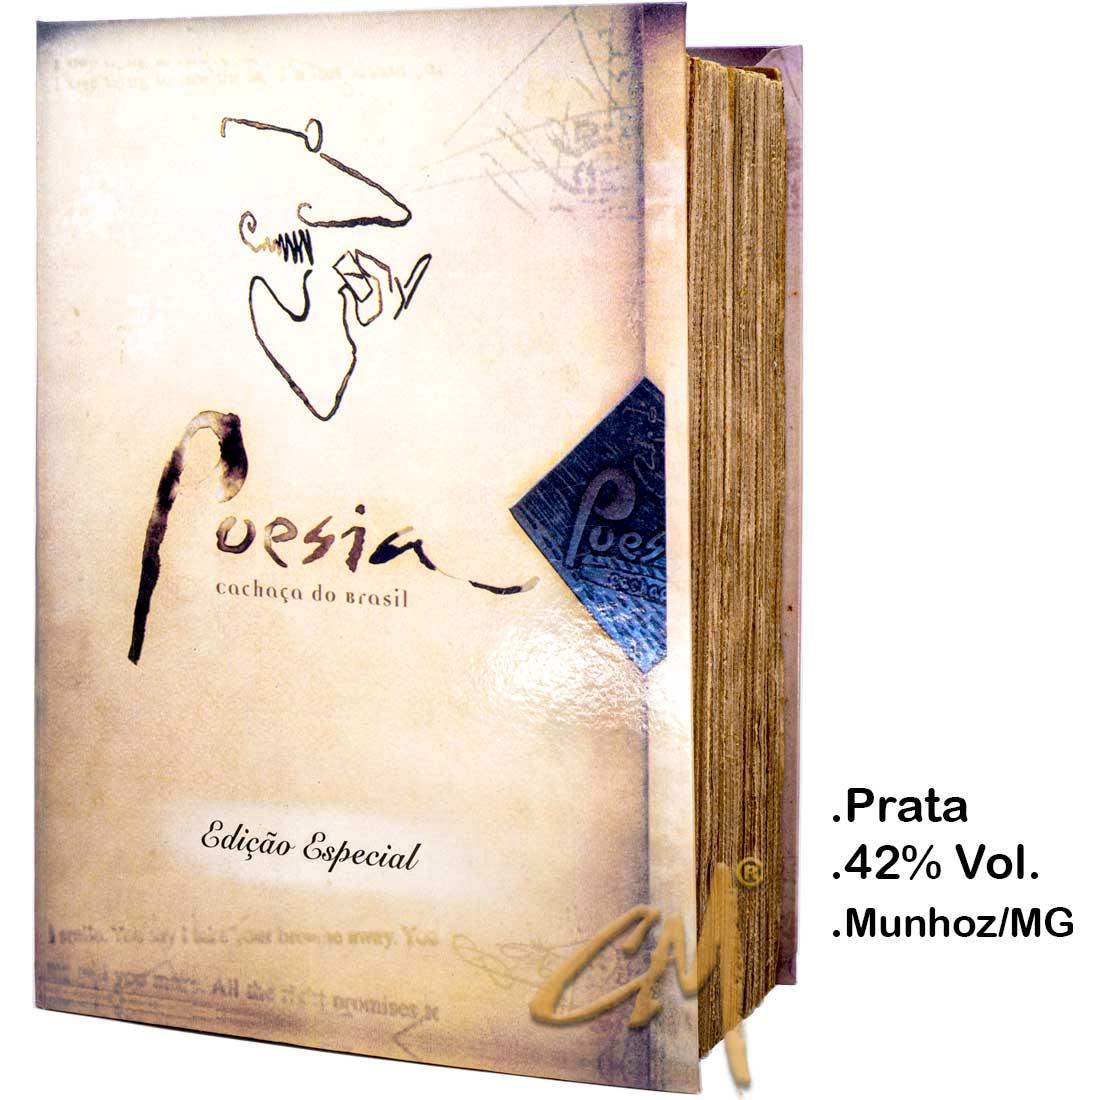 Cachaça Poesia 670 ml Caixa Livro (Munhoz - MG)